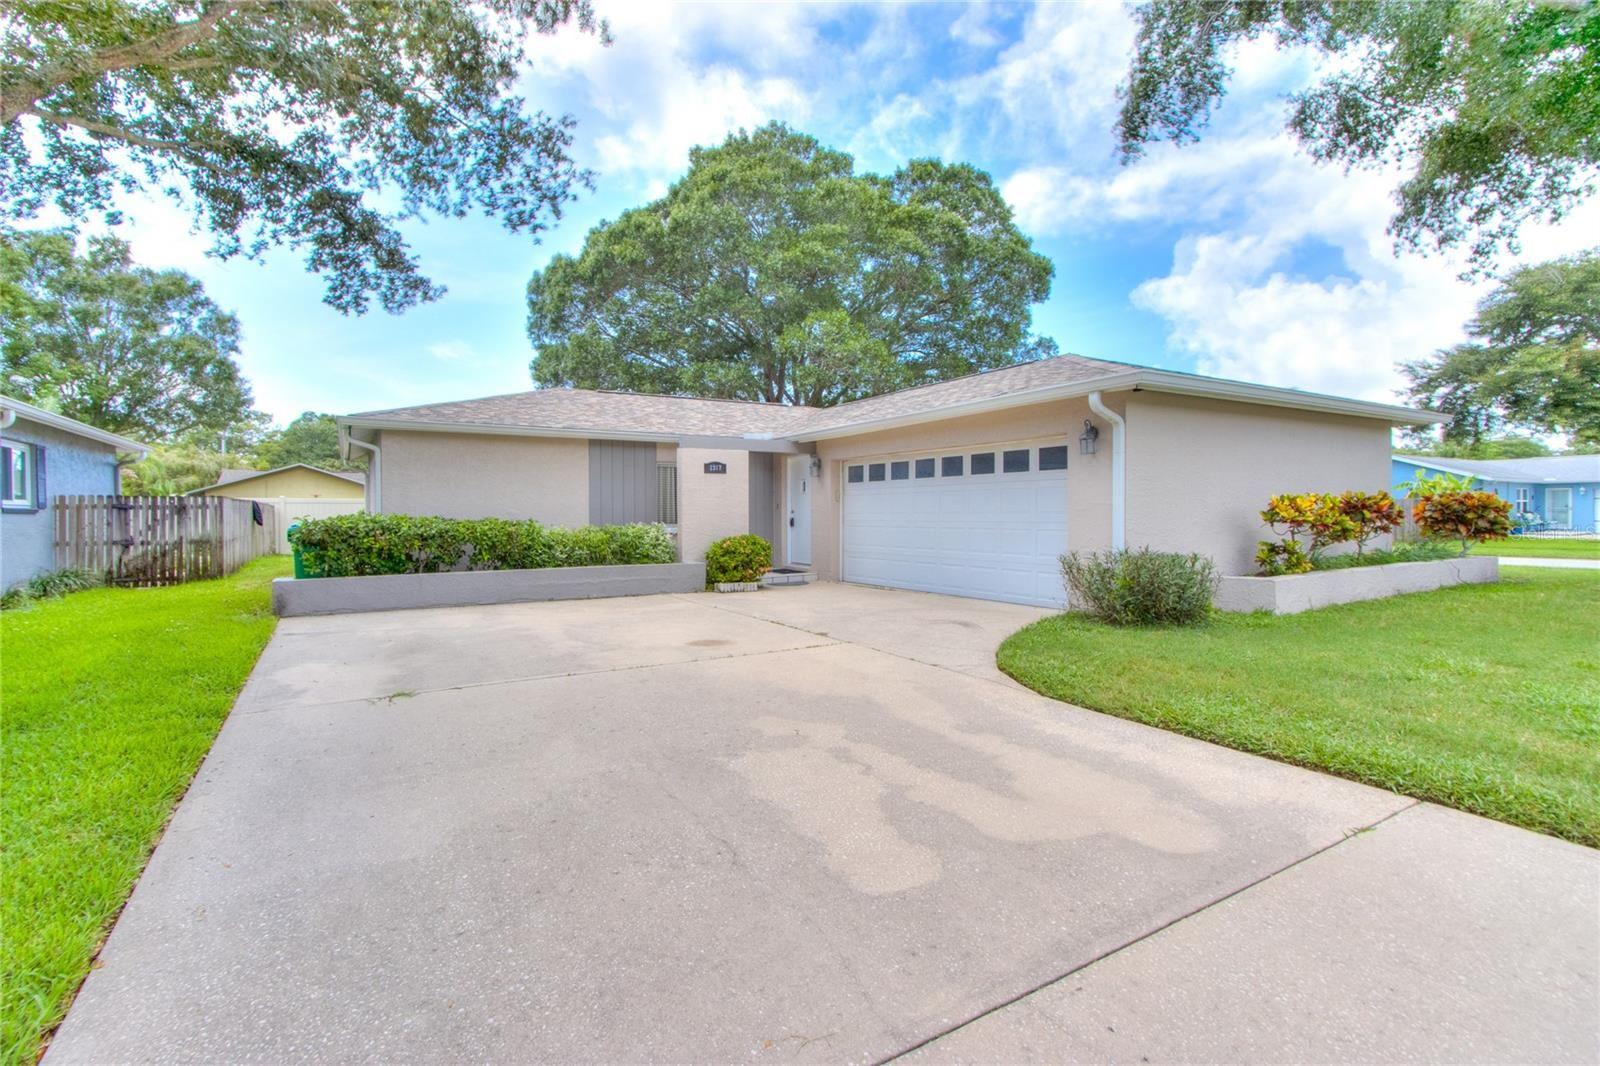 2317 LISTON CIRCLE, Palm Harbor, FL 34683 - #: U8132200